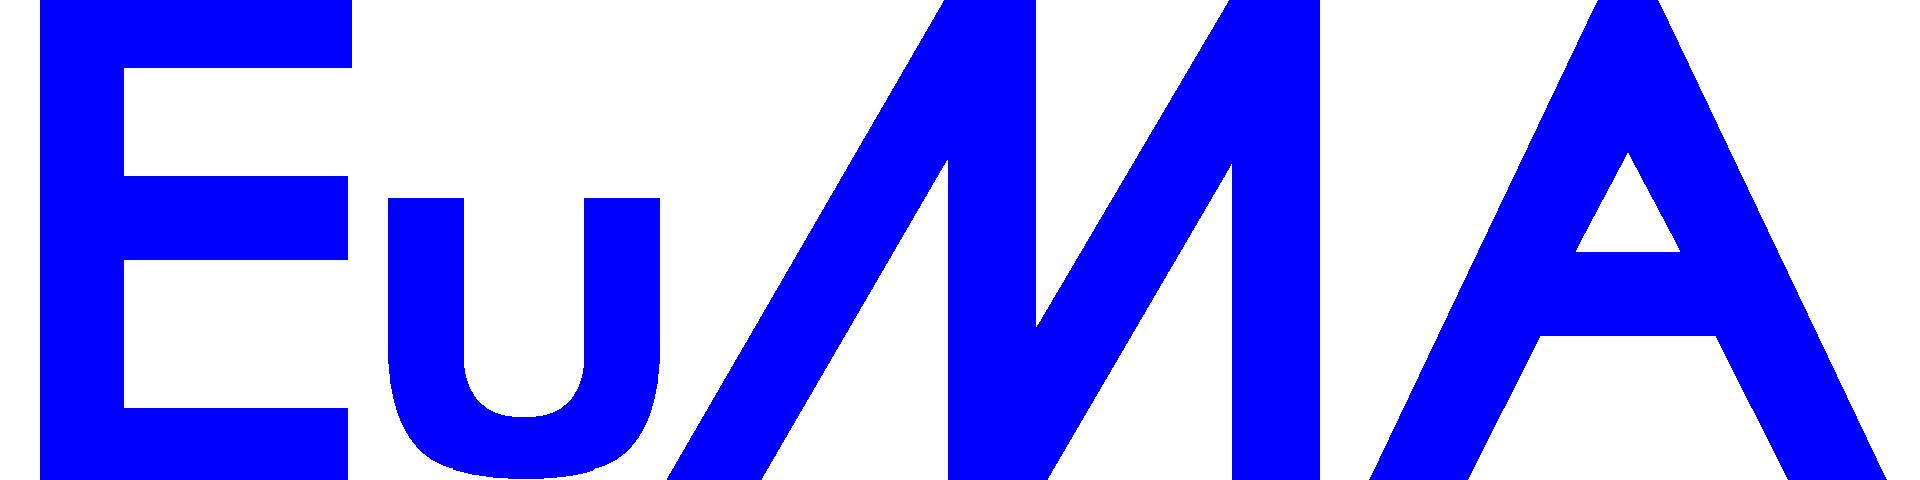 logo for European Microwave Association